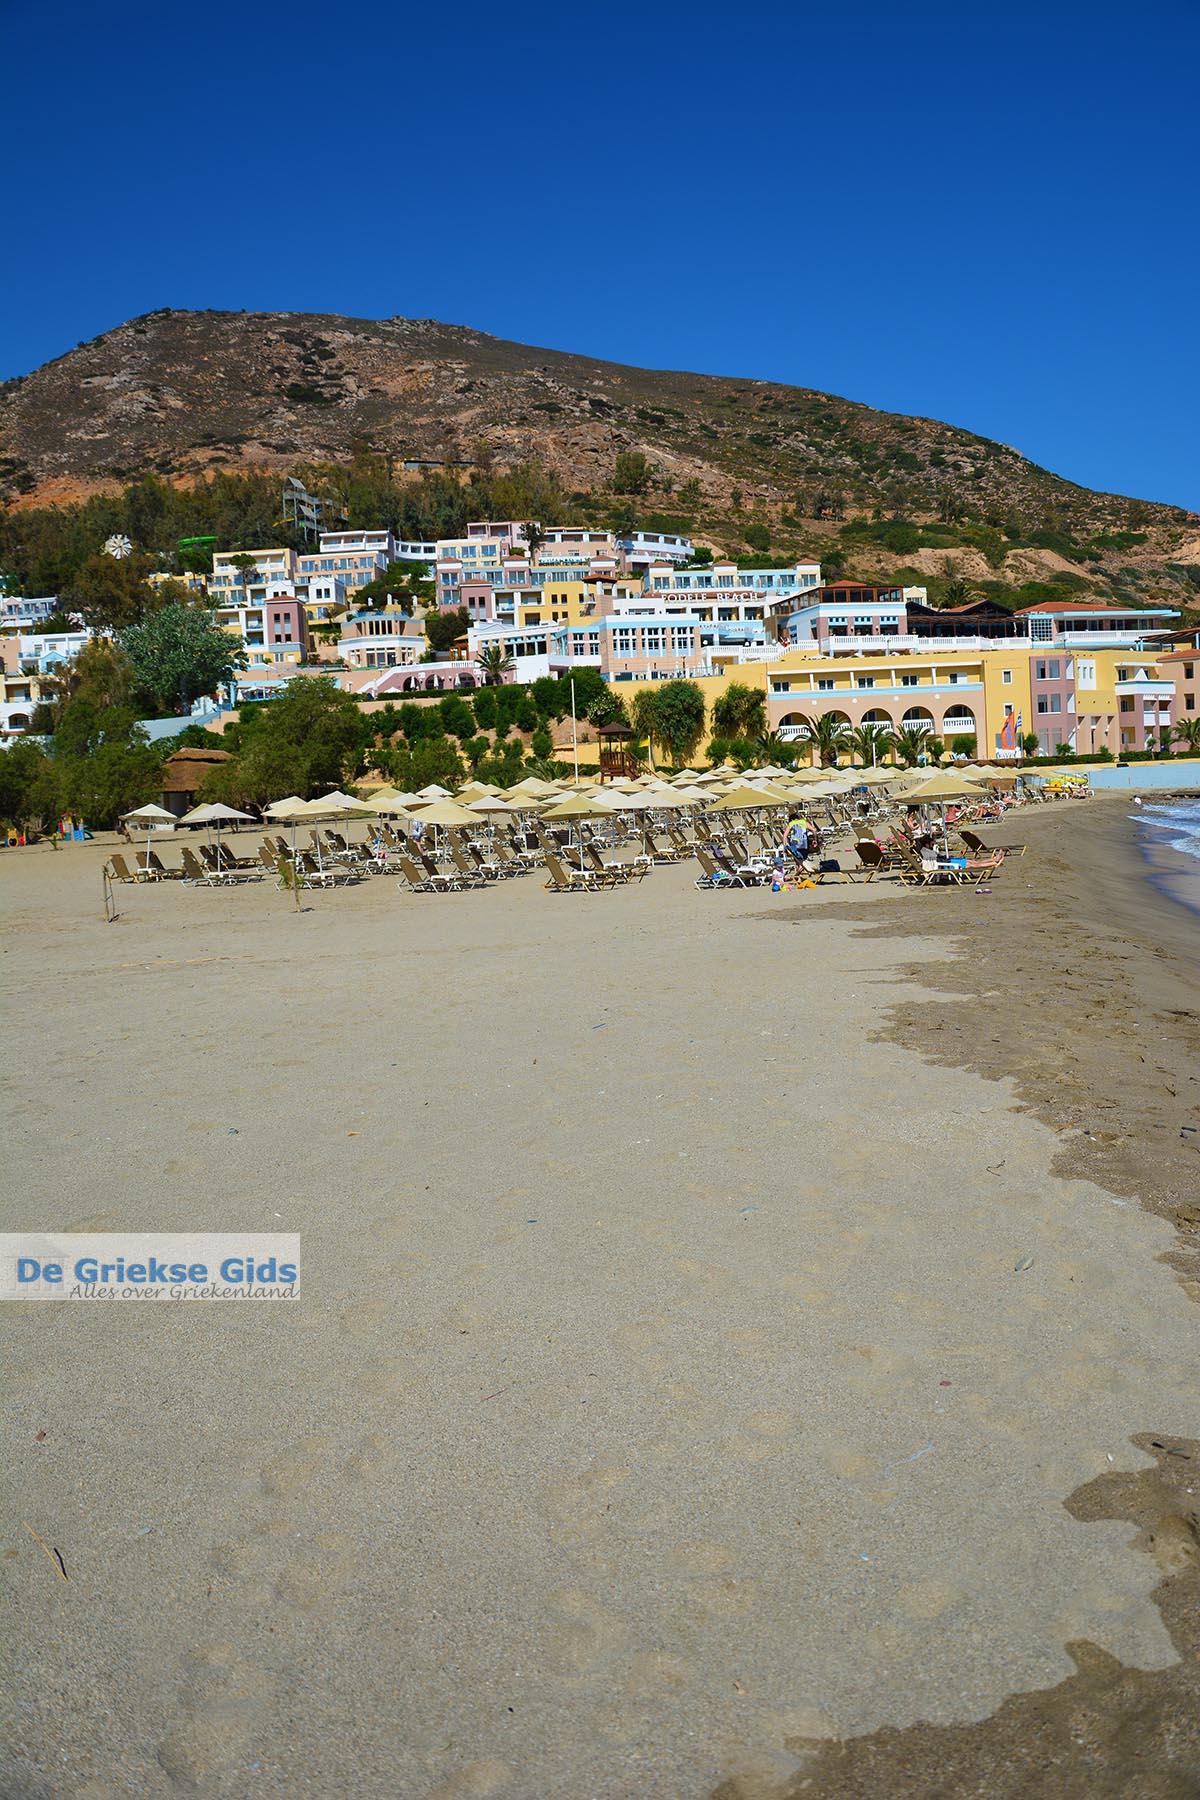 foto Fodele Kreta - Departement Heraklion - Foto 8